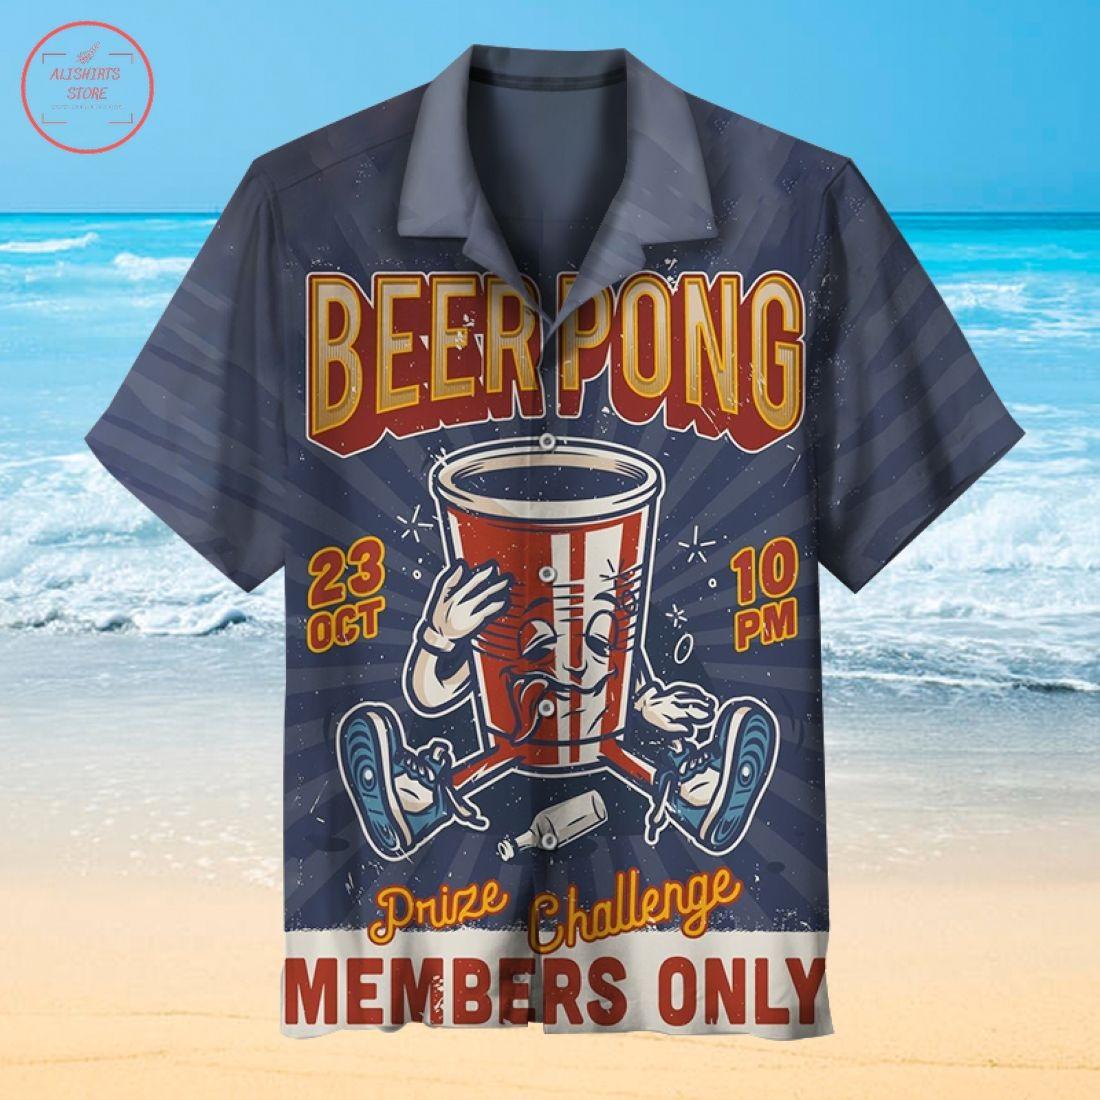 Beer pong drink challenge Hawaiian shirt